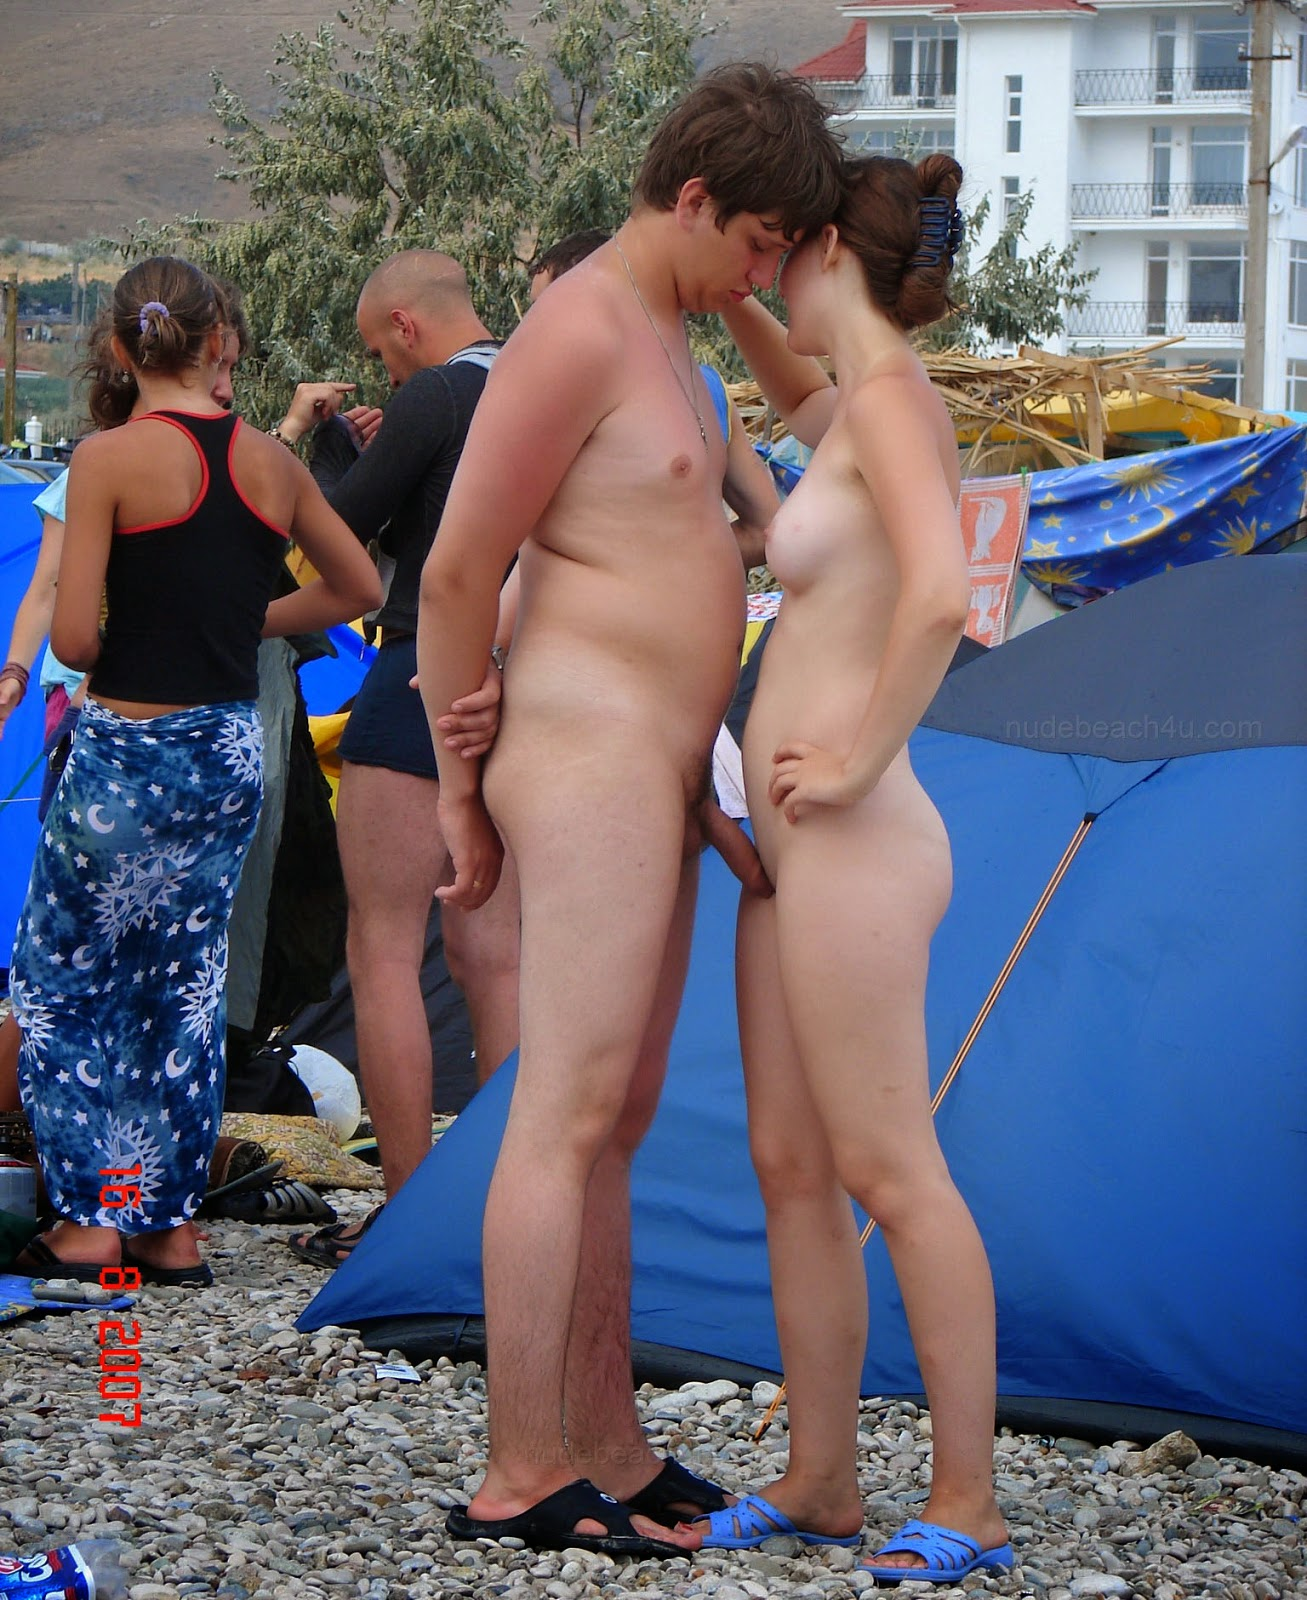 Remarkable, Crimea nude girls opinion